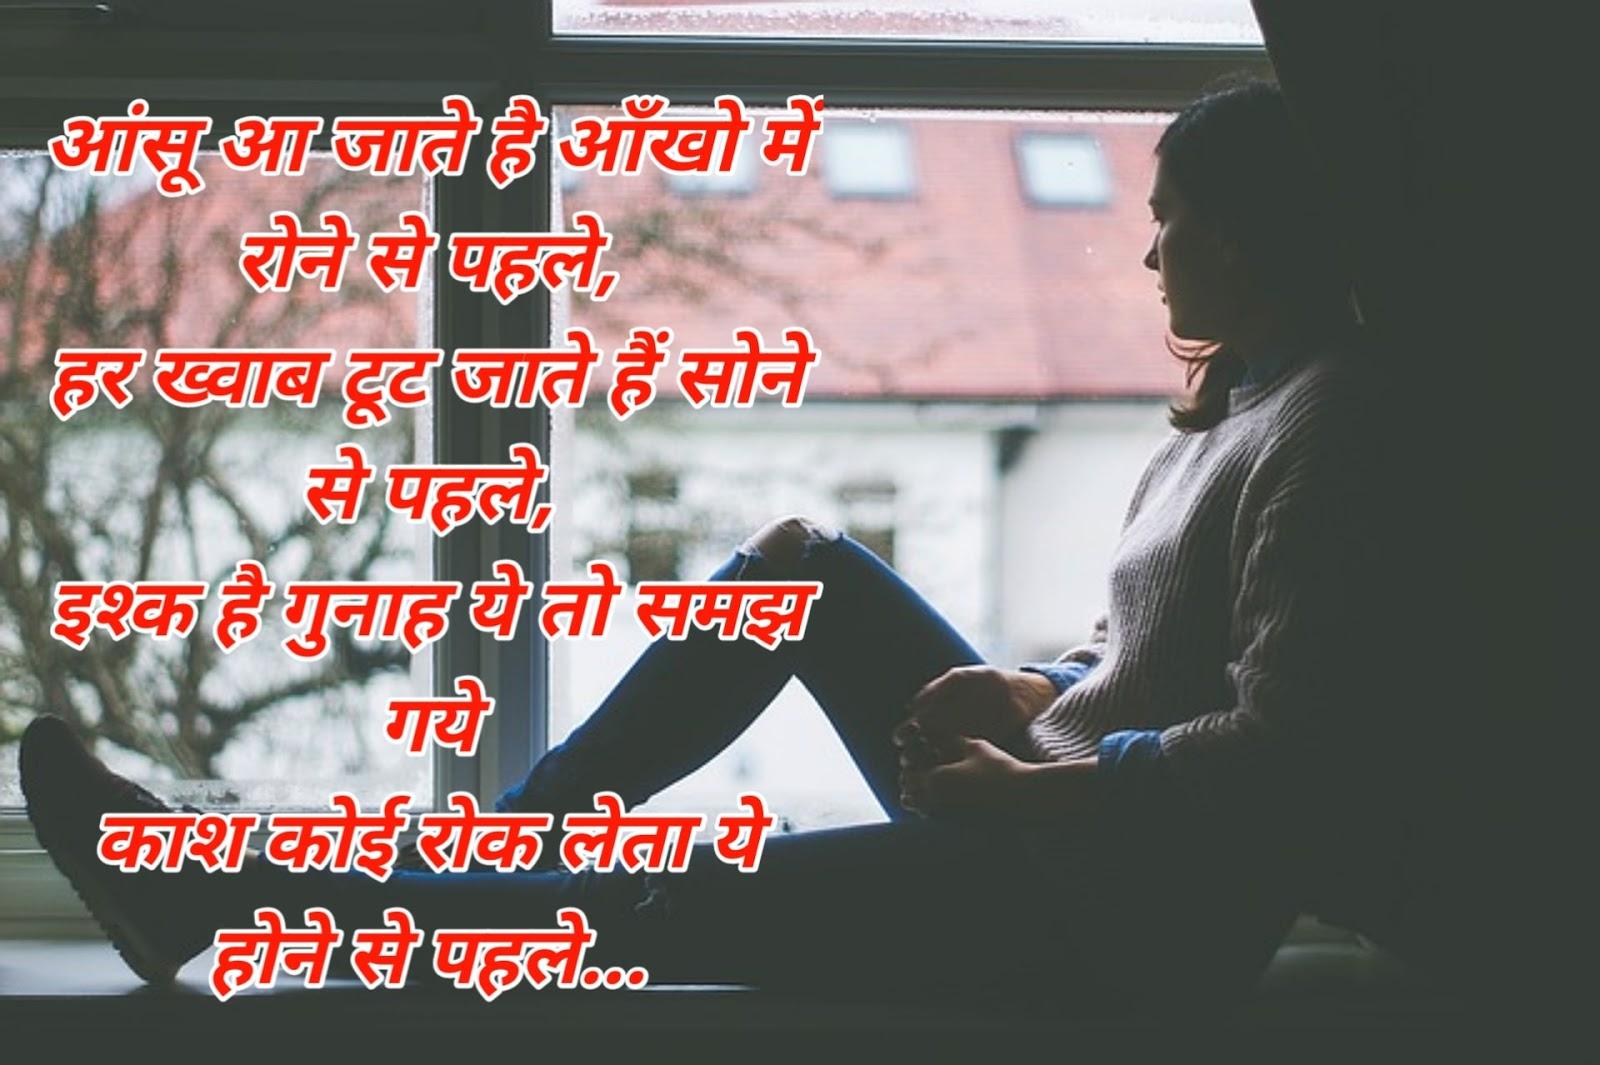 Sad shayari hindi mai